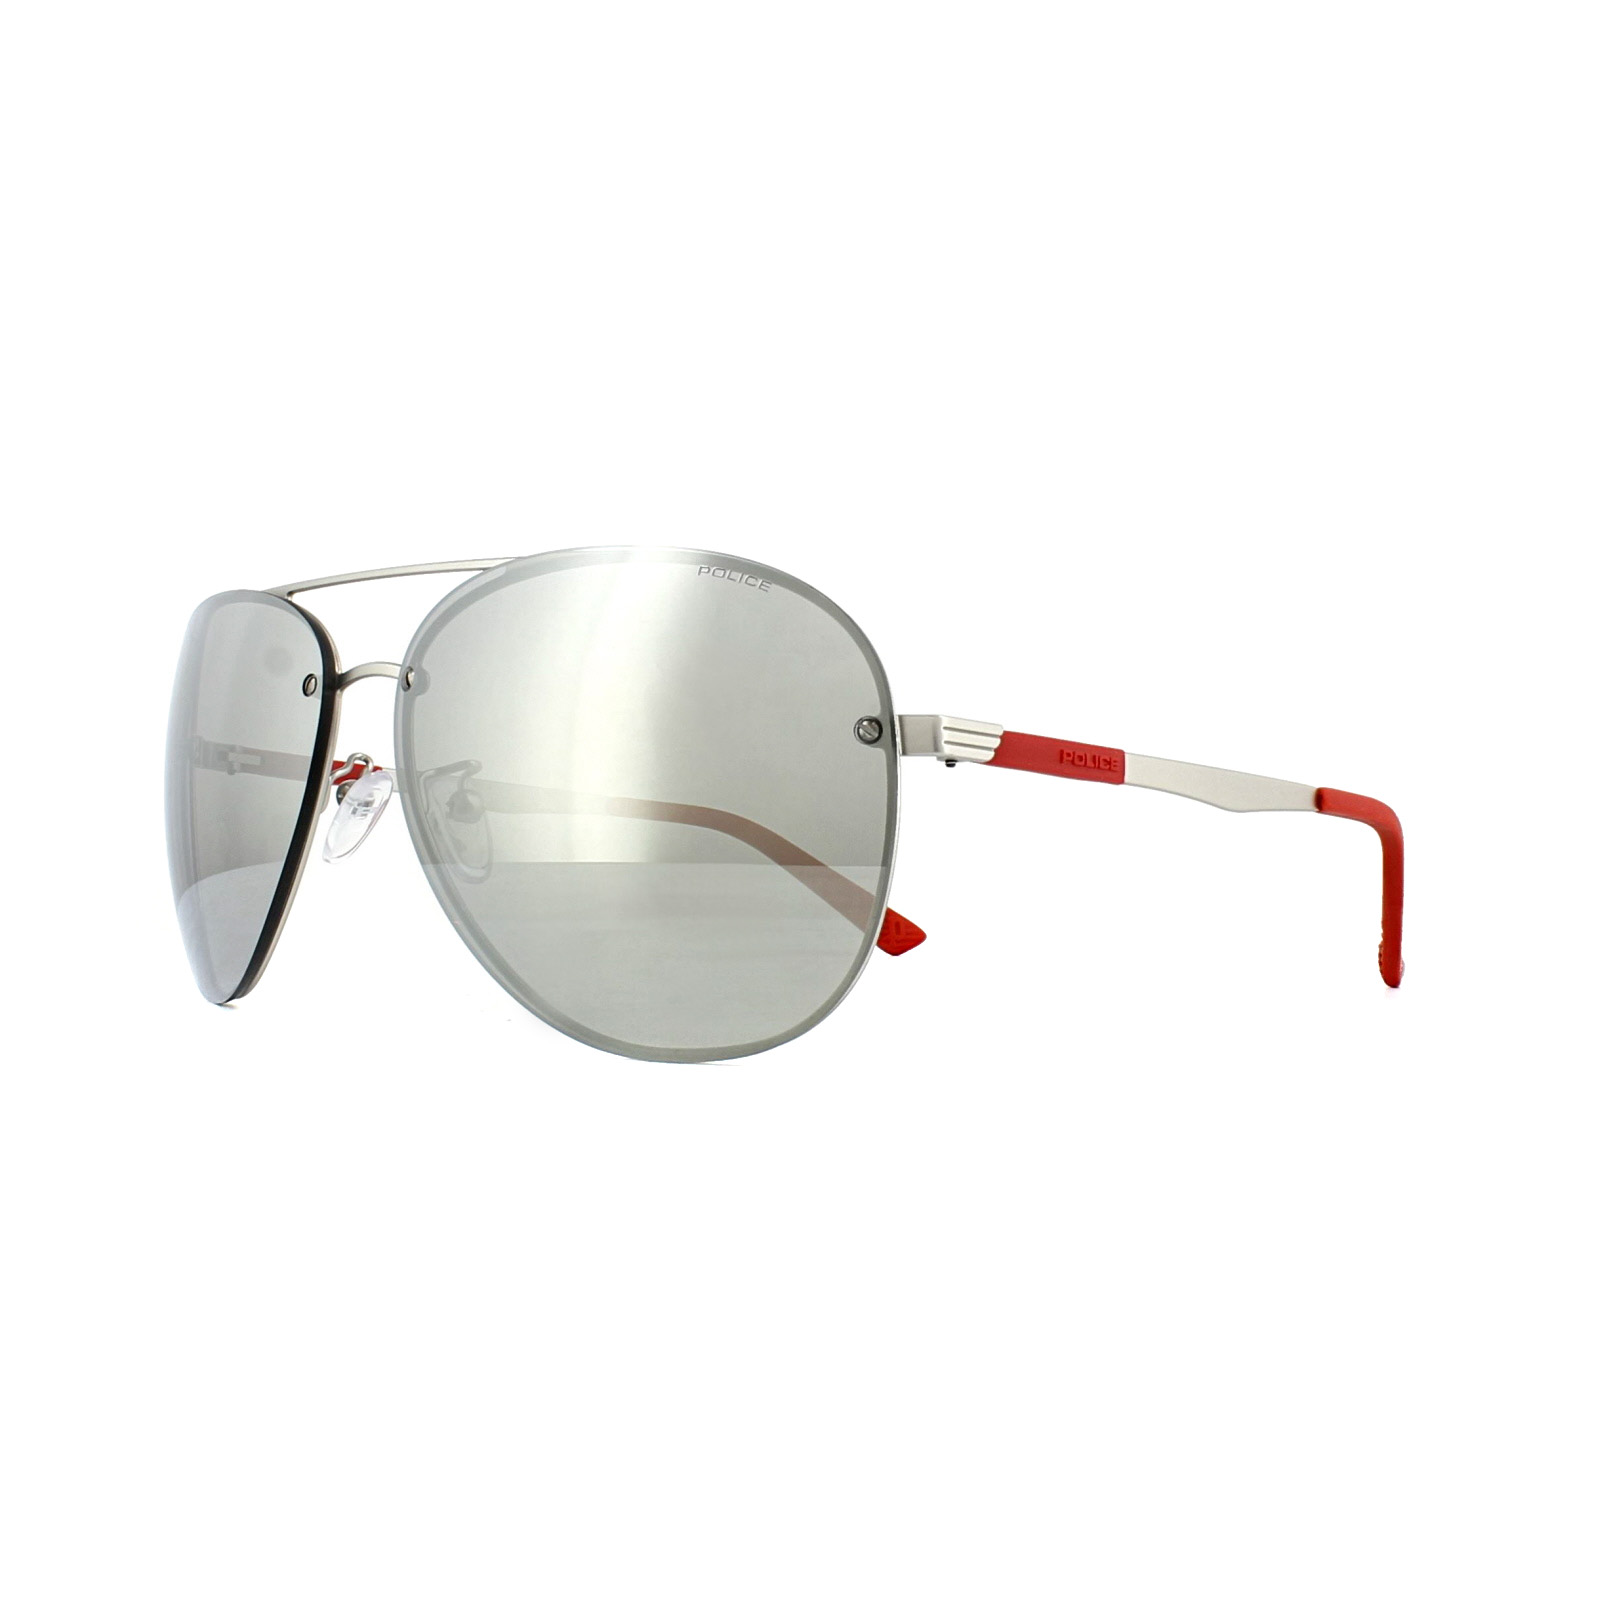 0610d7dcbfa3f Sentinel Police Sunglasses SPL379 Court 3 581X Matt Palladium Red Silver  Mirror